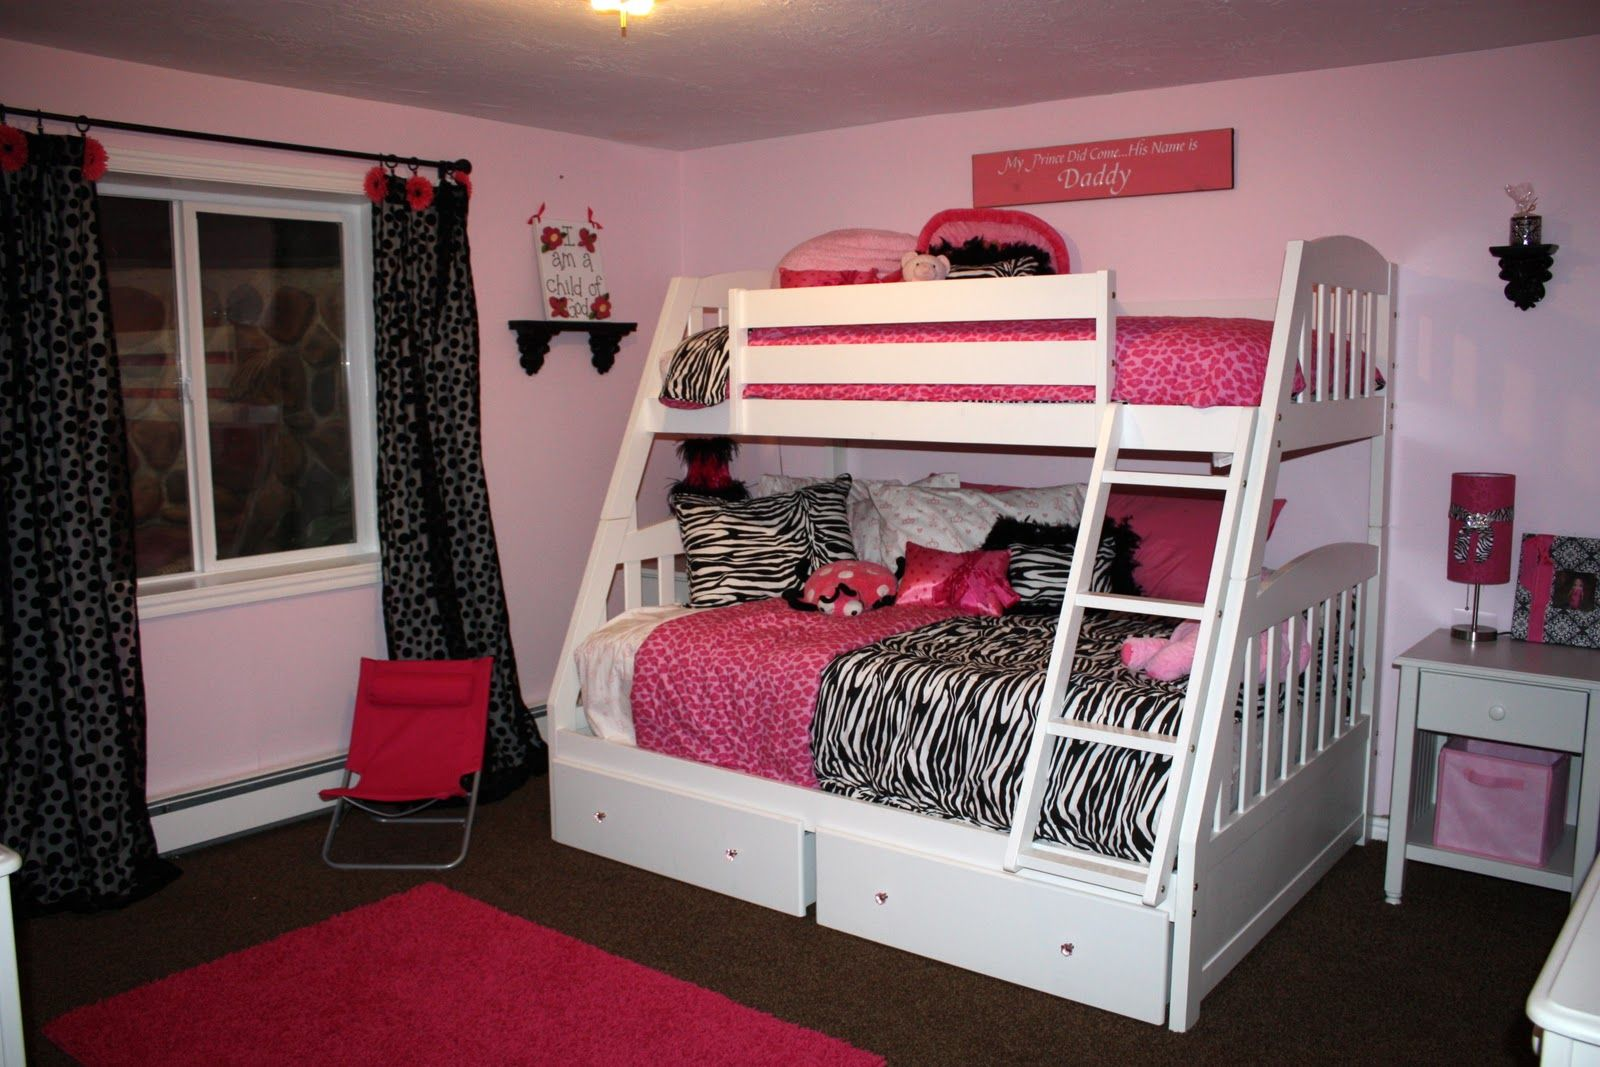 Cheap Cute Bedroom Ideas For Teenage Girls — Home Office ... on Cheap Bedroom Ideas For Small Rooms  id=28349